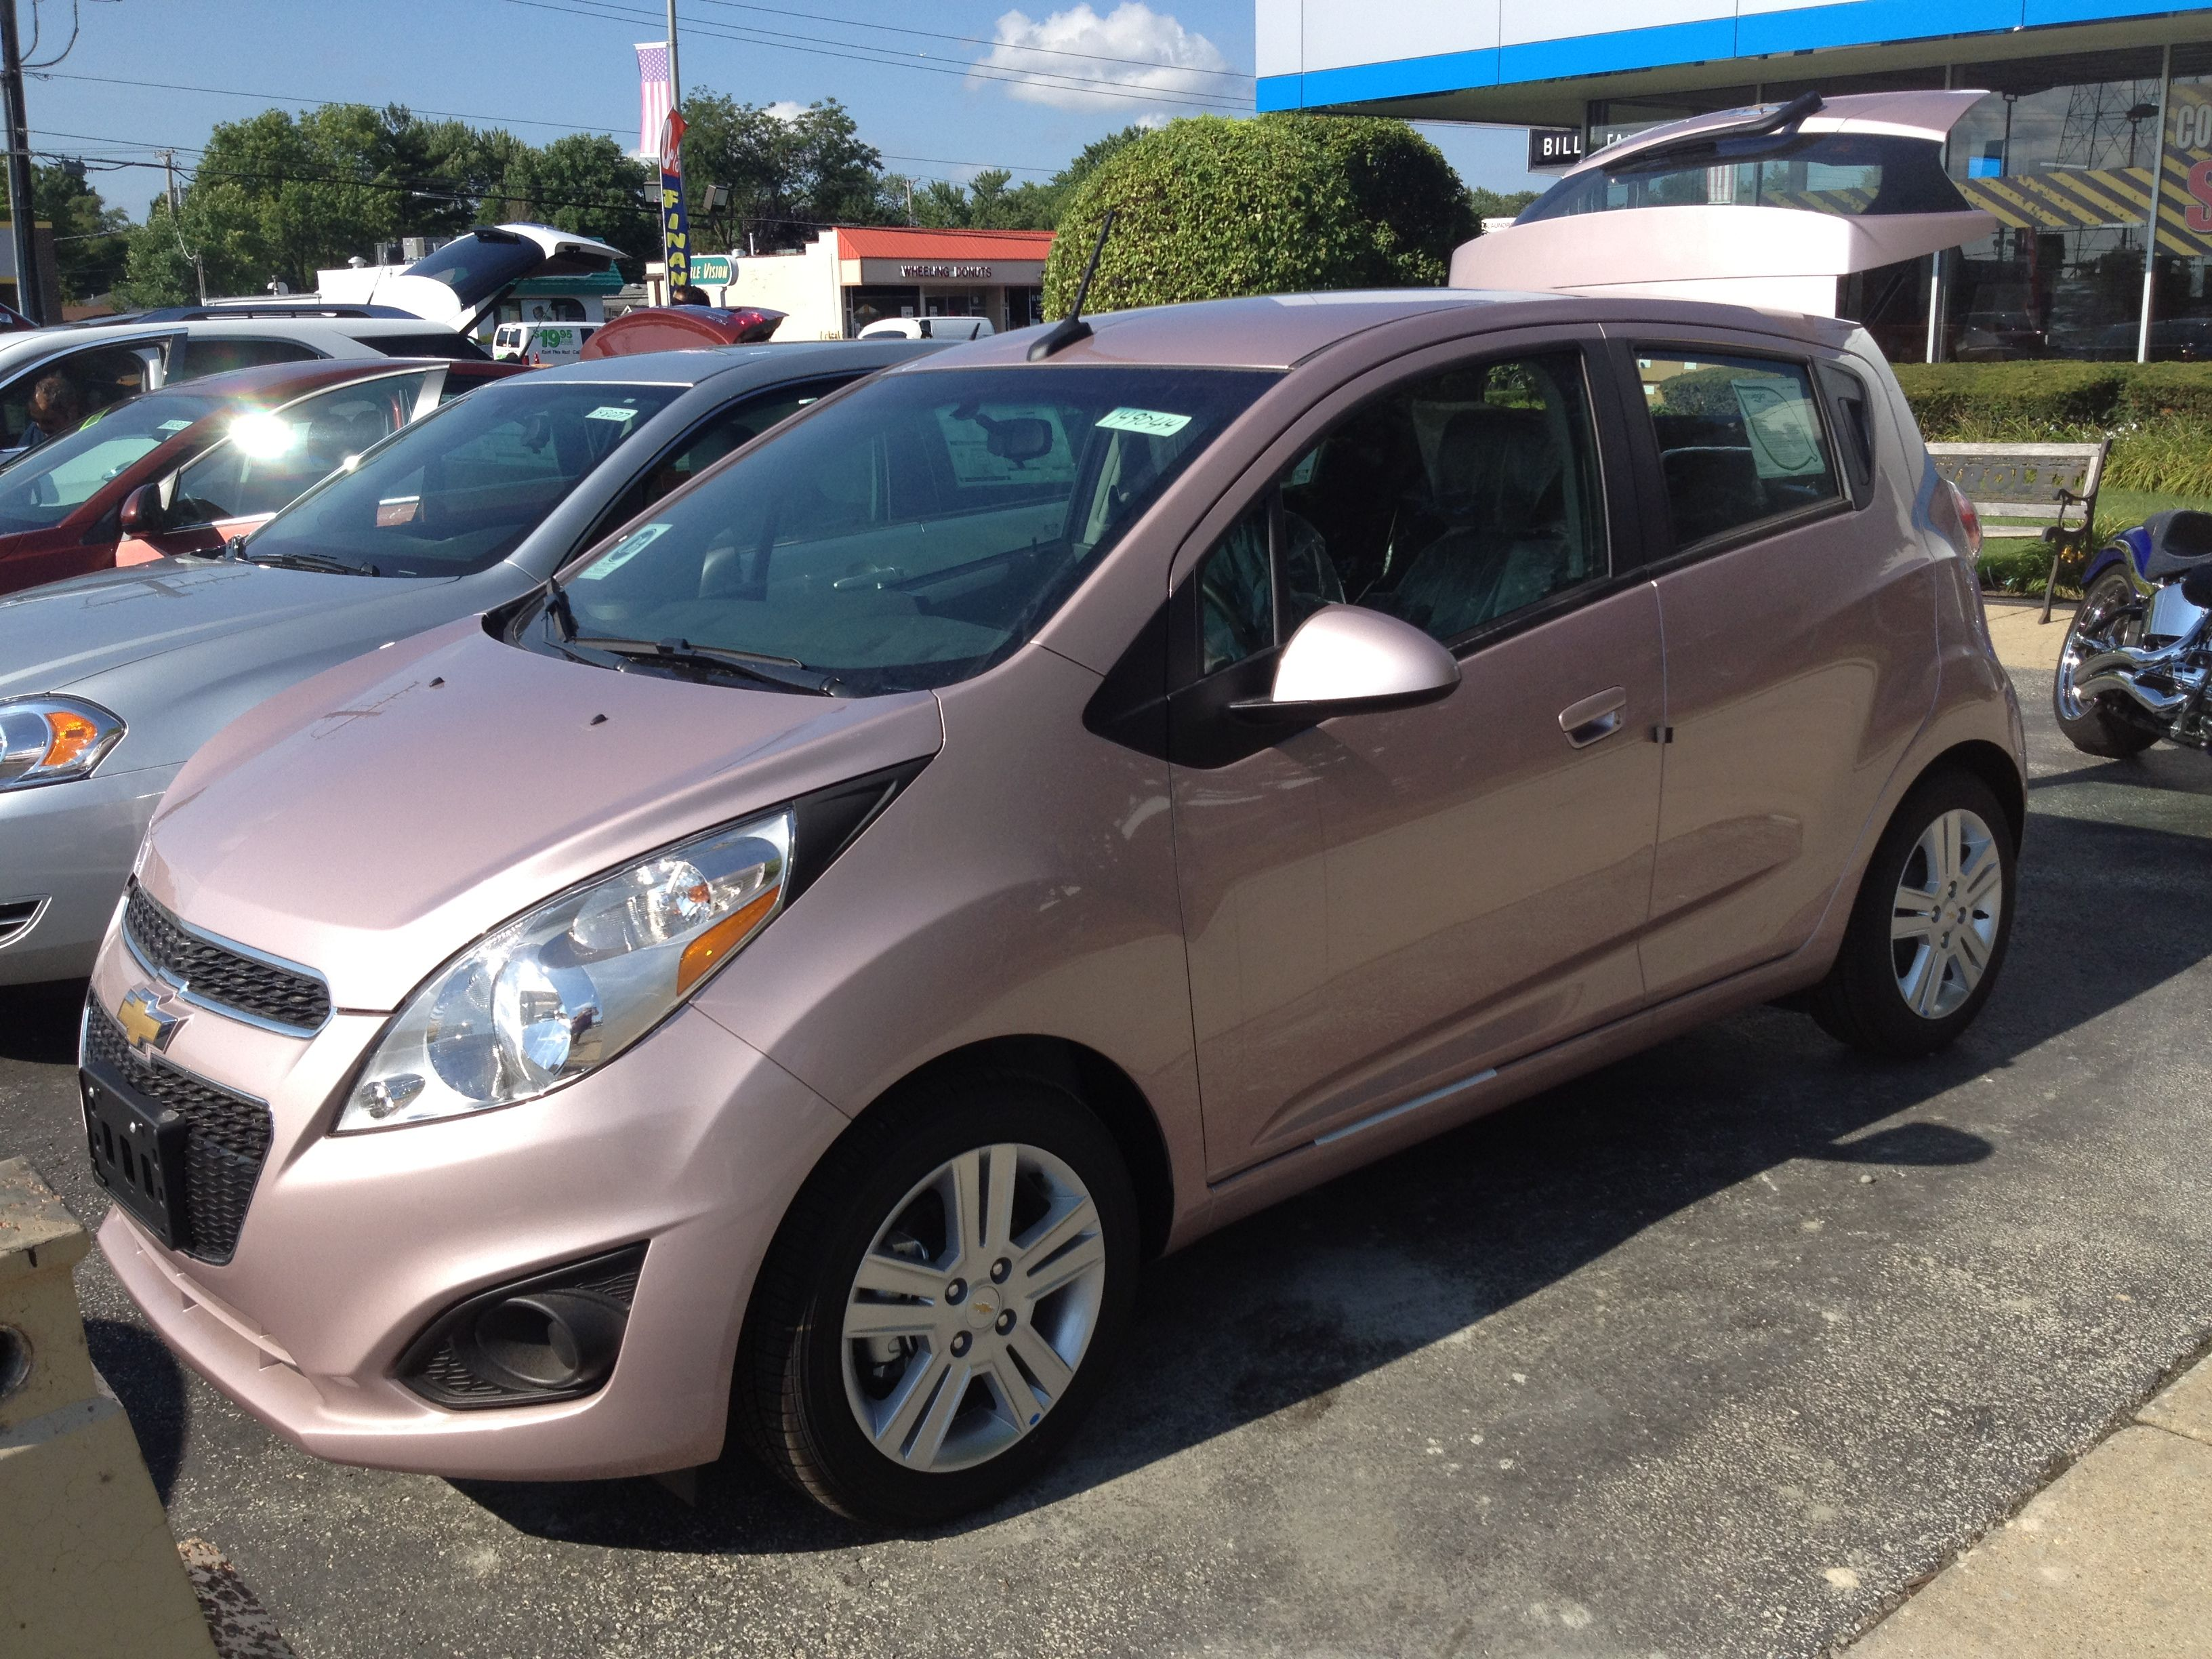 New Techno Pink Chevy Spark Http Www Chevrolet Com Spark Mini